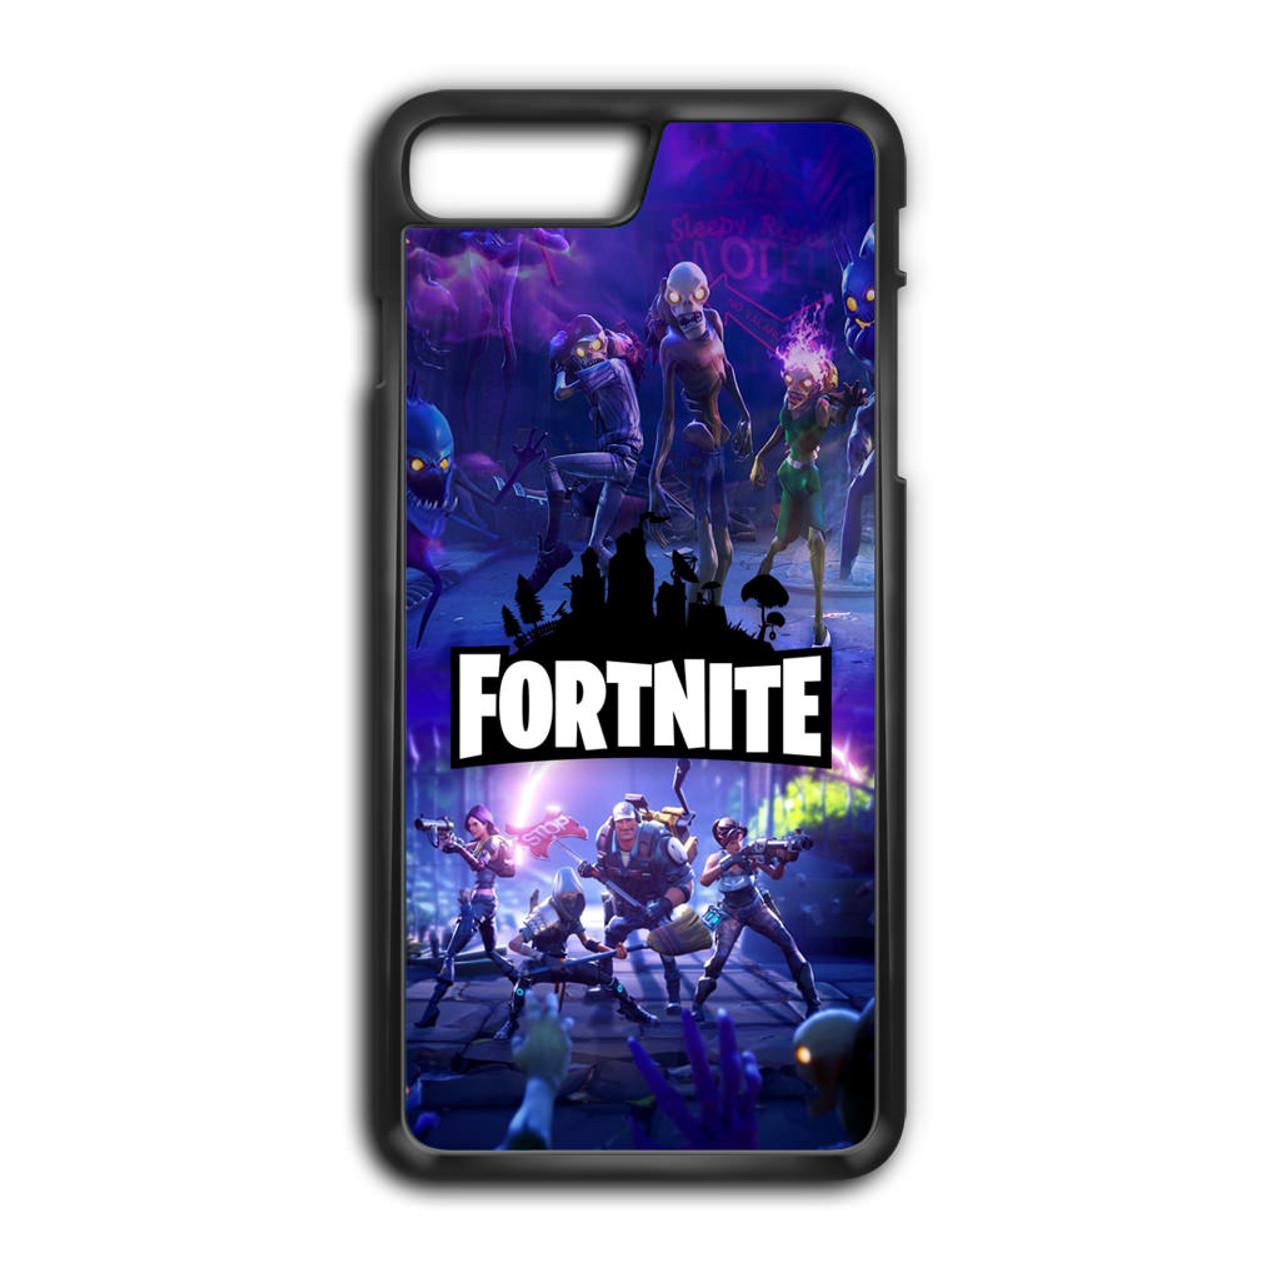 is fortnite on iphone 7 plus